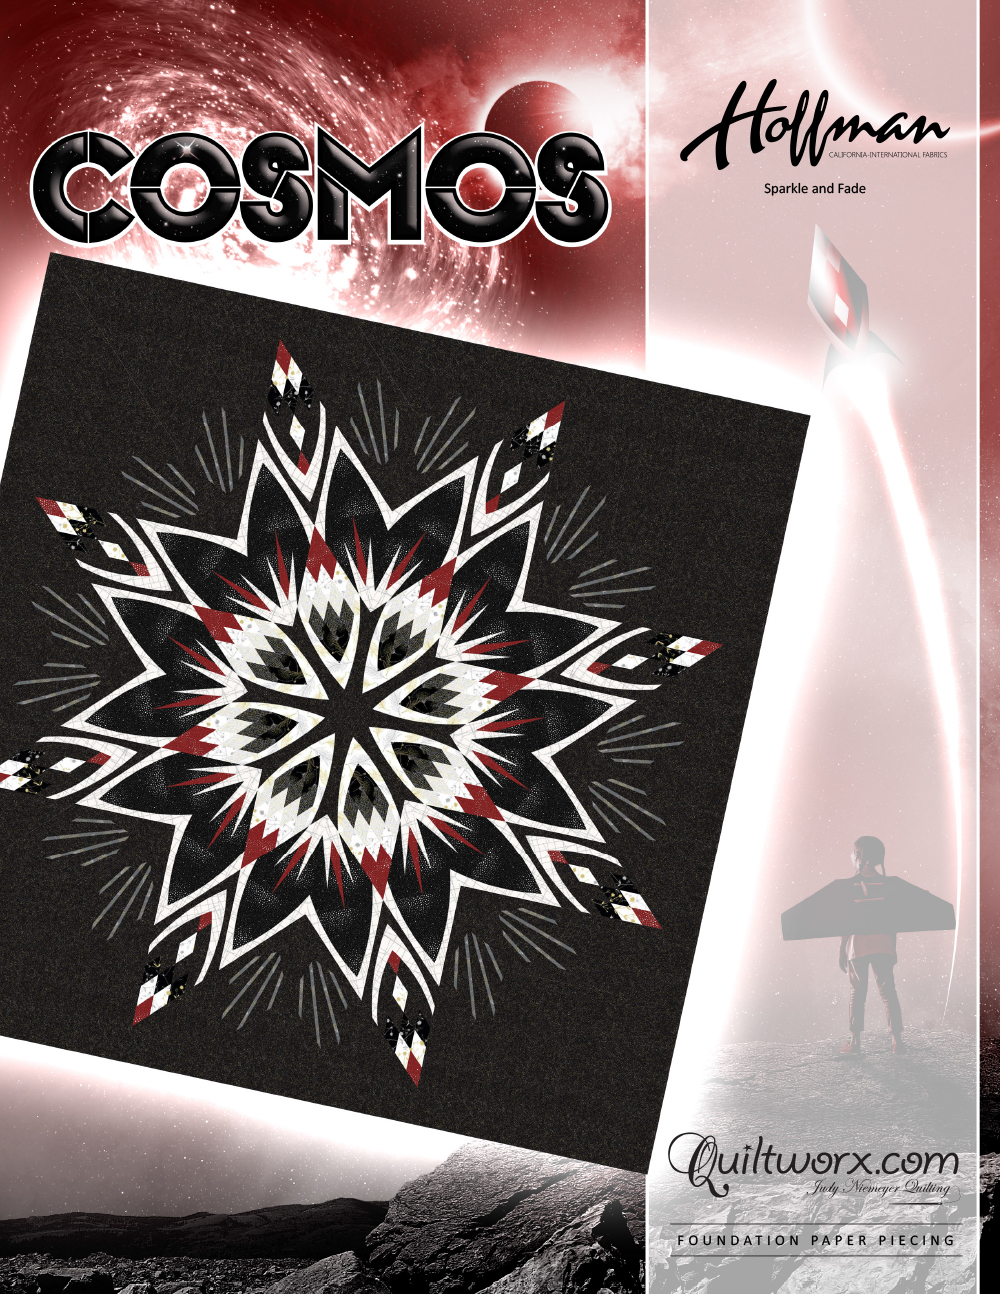 Cosmos-Hoffman-CS